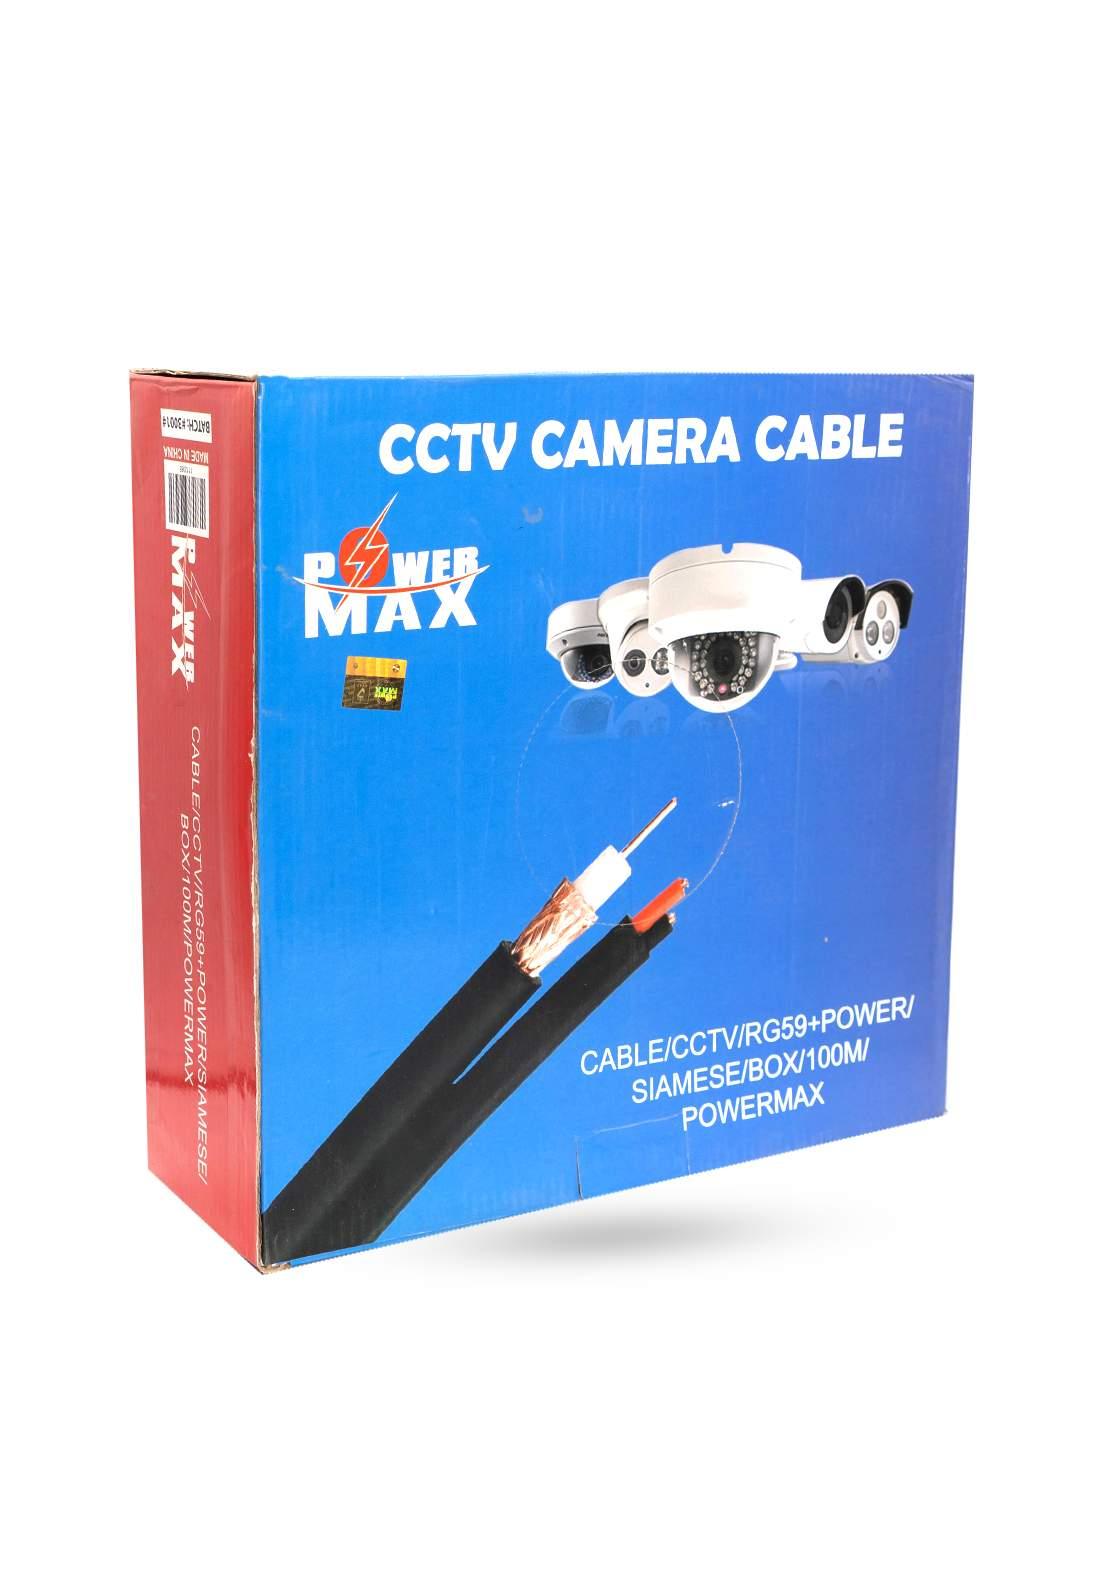 Power Max  CCTV RG59 and Power Siamese Cable 100M - Black كابل كاميرا